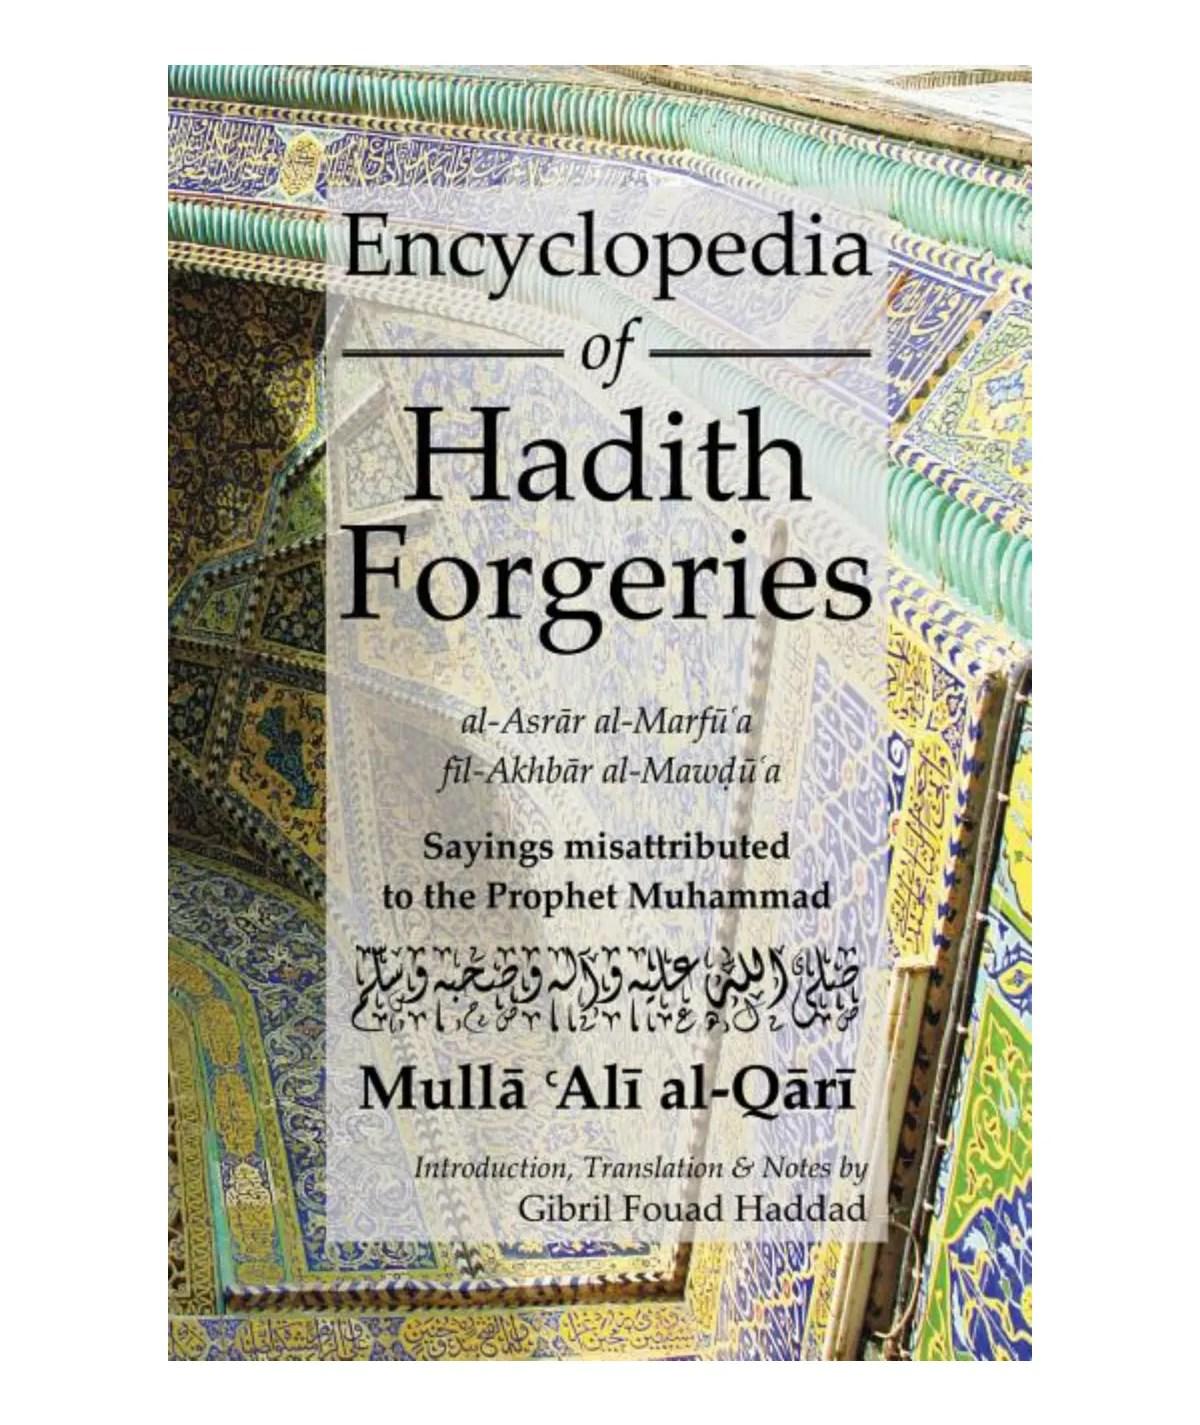 Encyclopedia of Hadith Forgeries: Al-Asrar Al-Marfu'a Fil-Akhbar Al-Mawdu'a: Sayings Misattributed to the Prophet Muhammad: Al-Qari, Mulla Ali B Sultan Muhammad